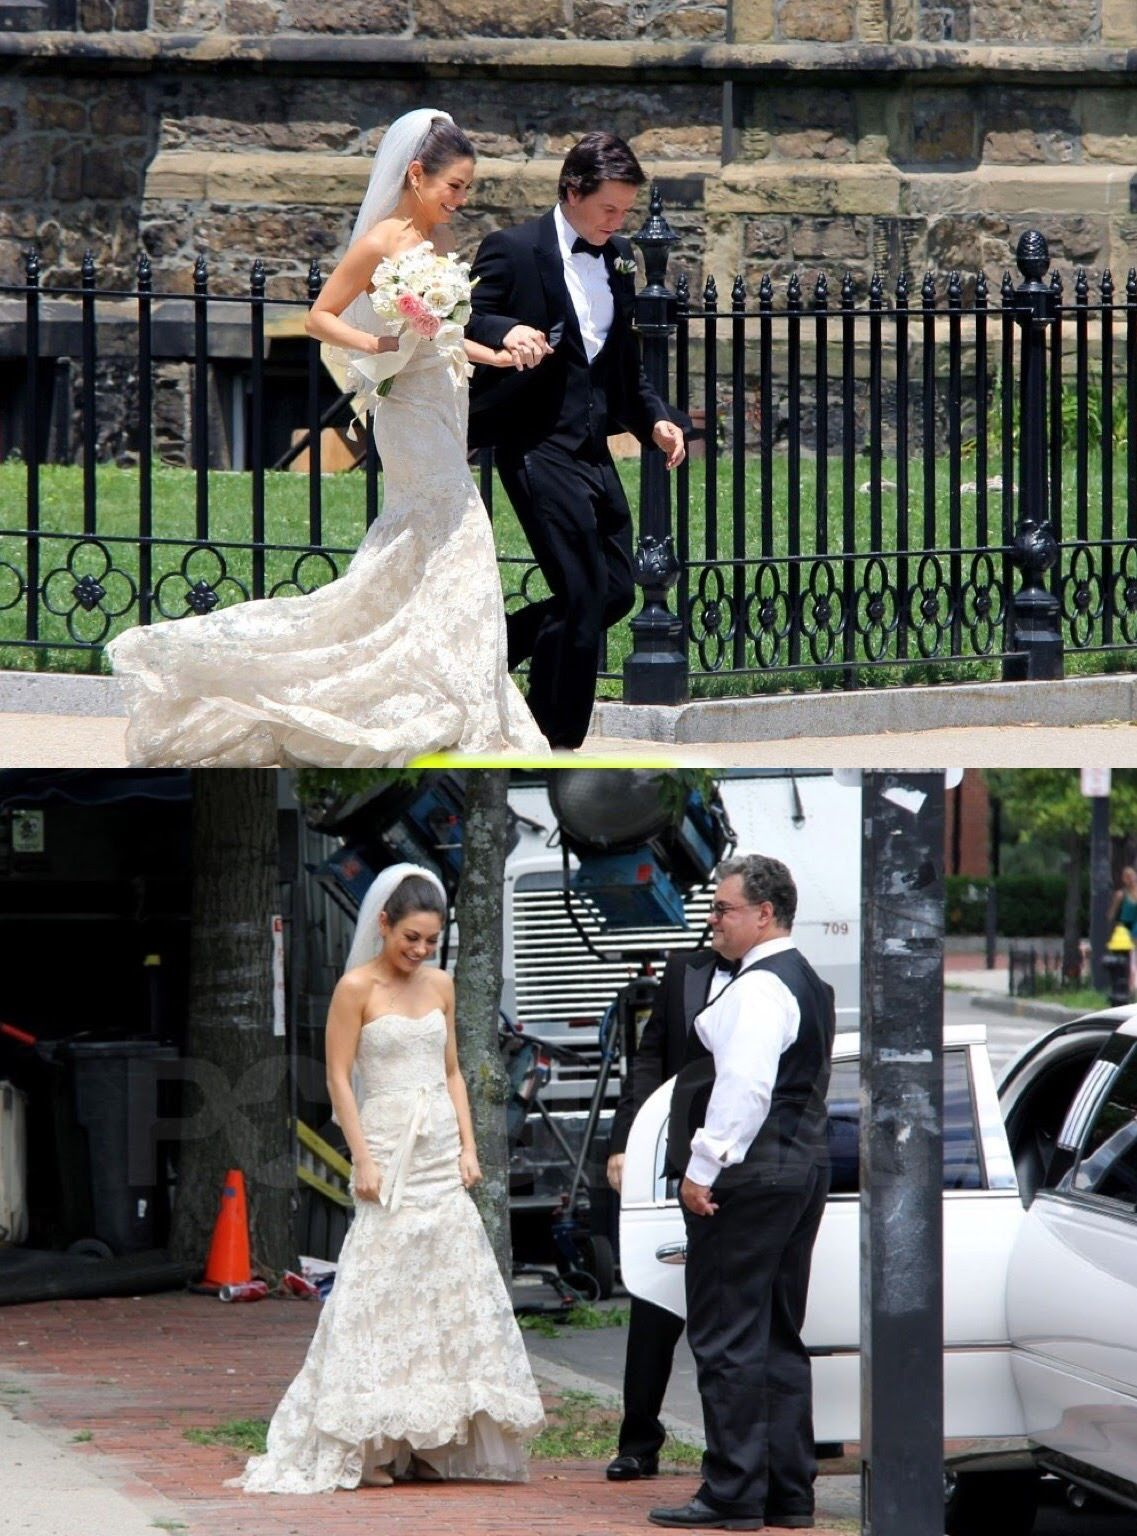 Mila Kunis In Wedding Scene With Actor Mark Wahlberg Character Lori Collins